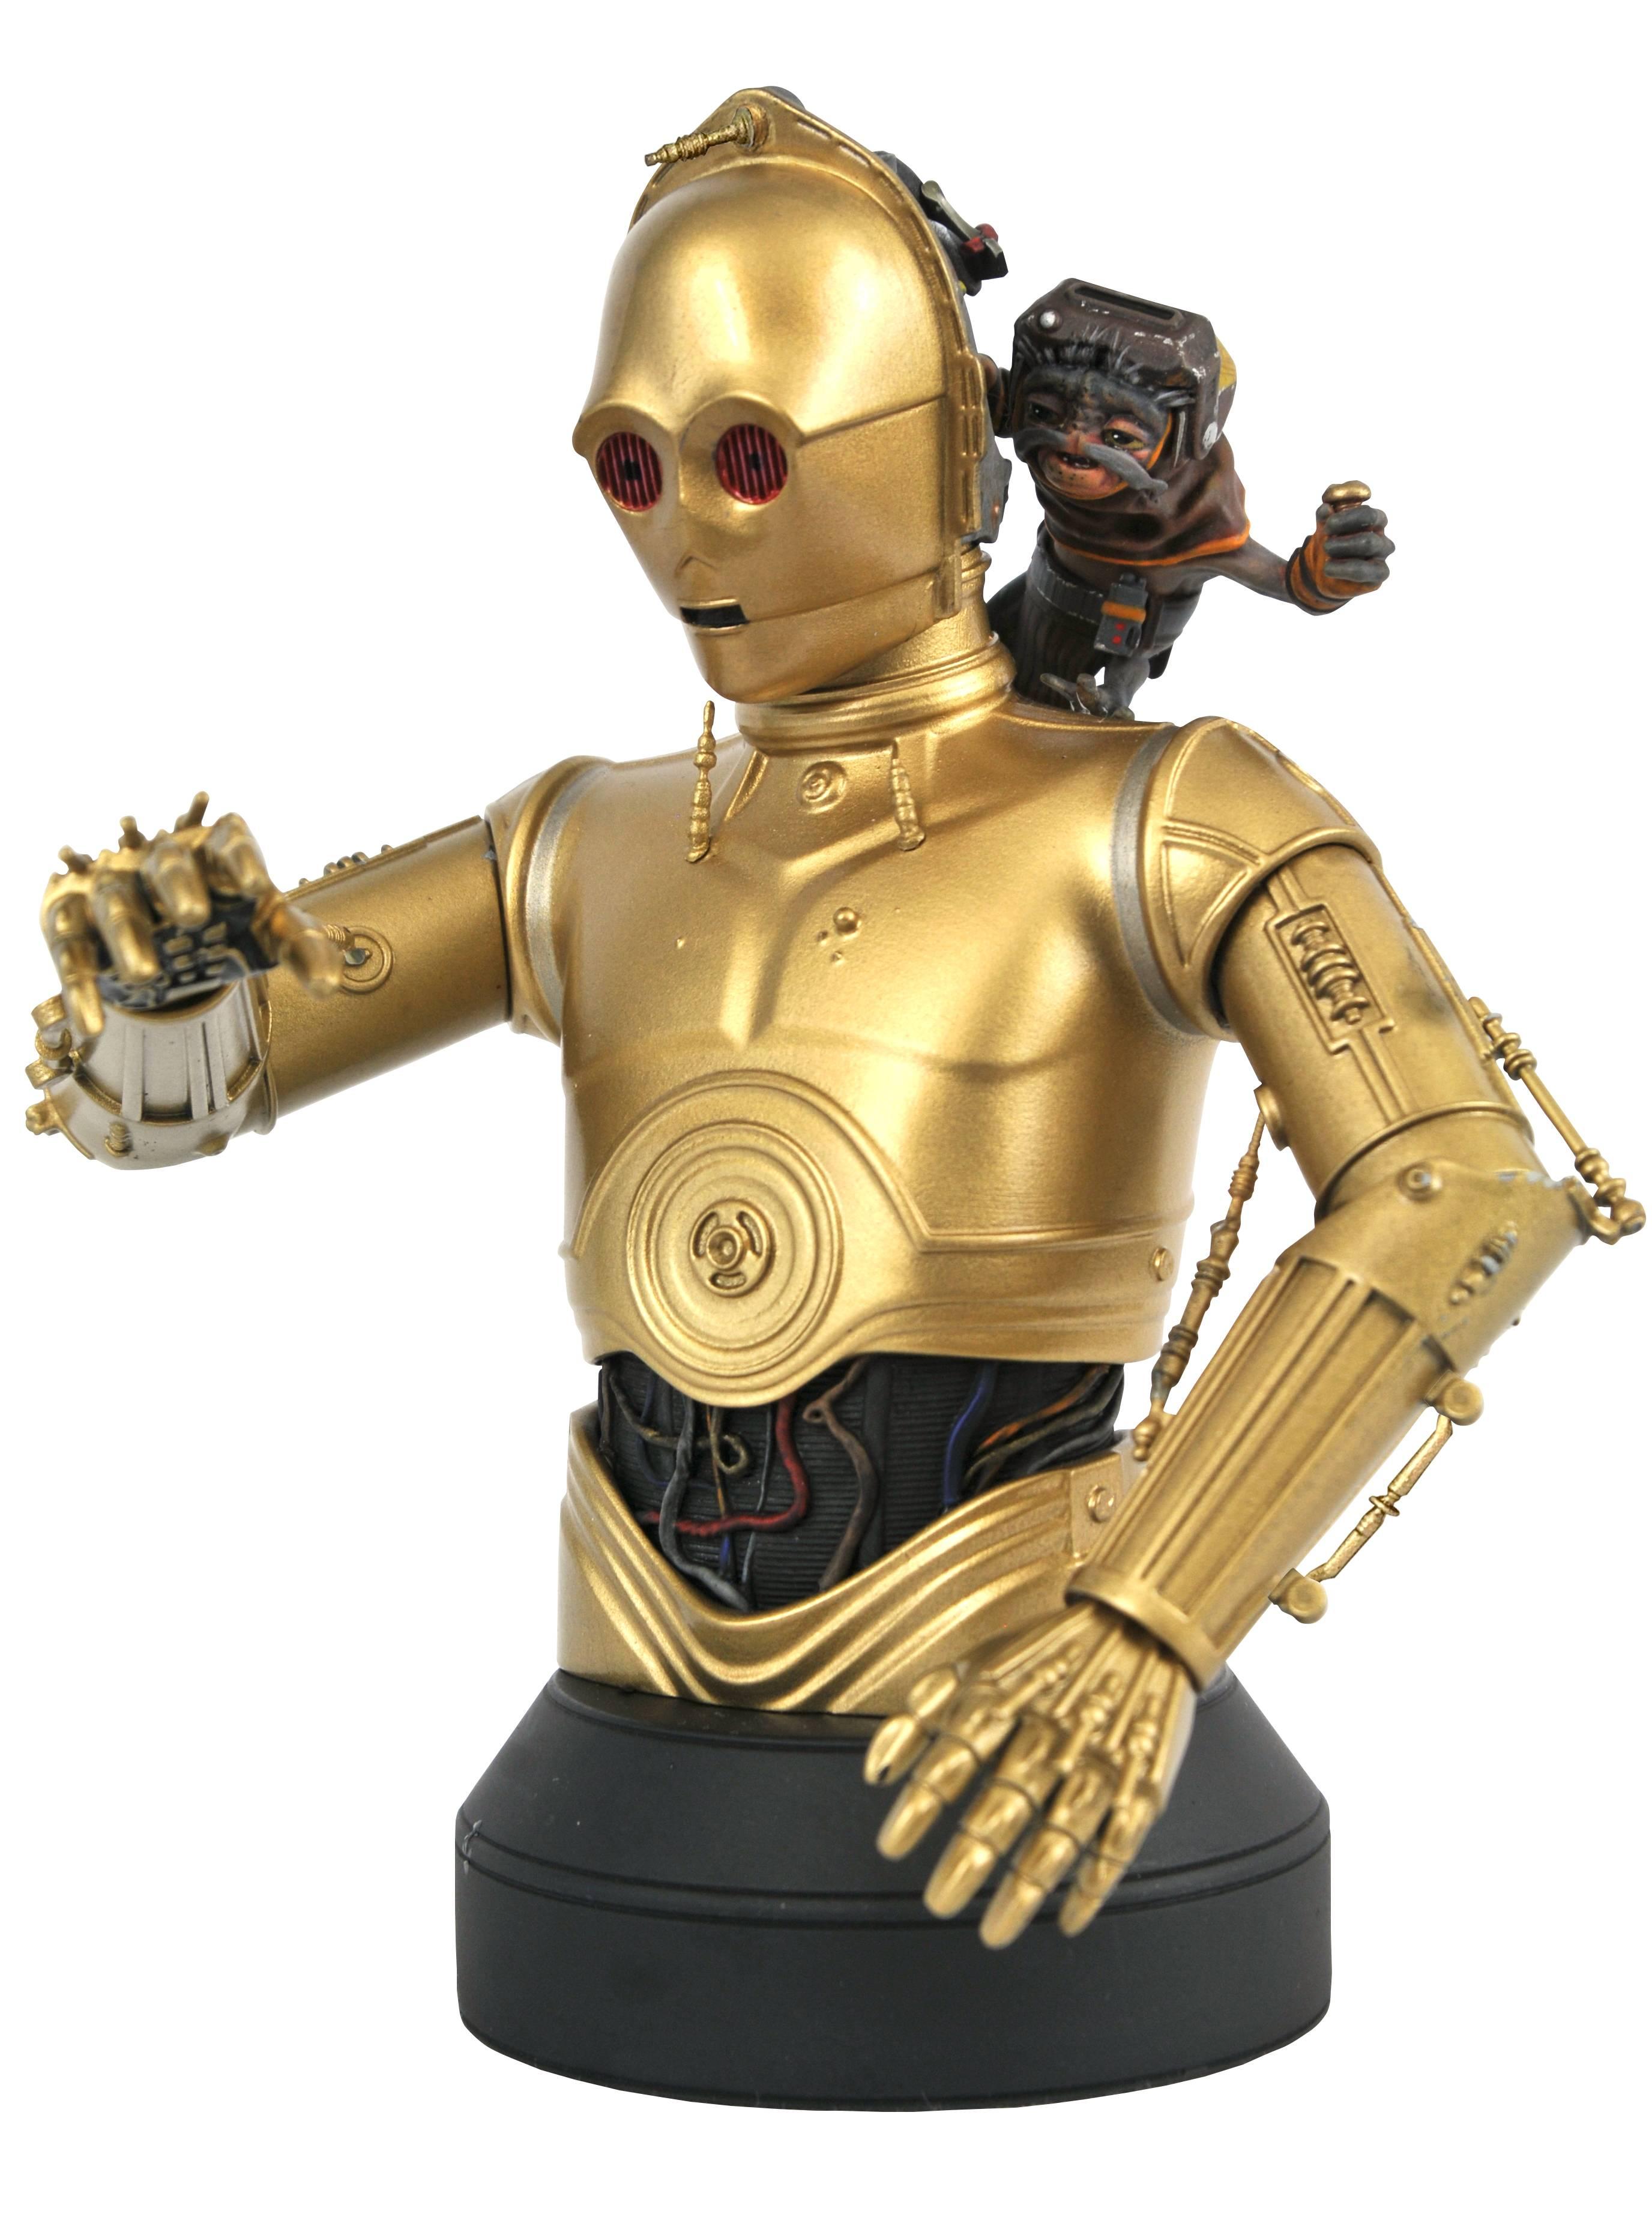 Star Wars - The Rise of Skywalker - C3PO & Babu Frik 1/6 Bust